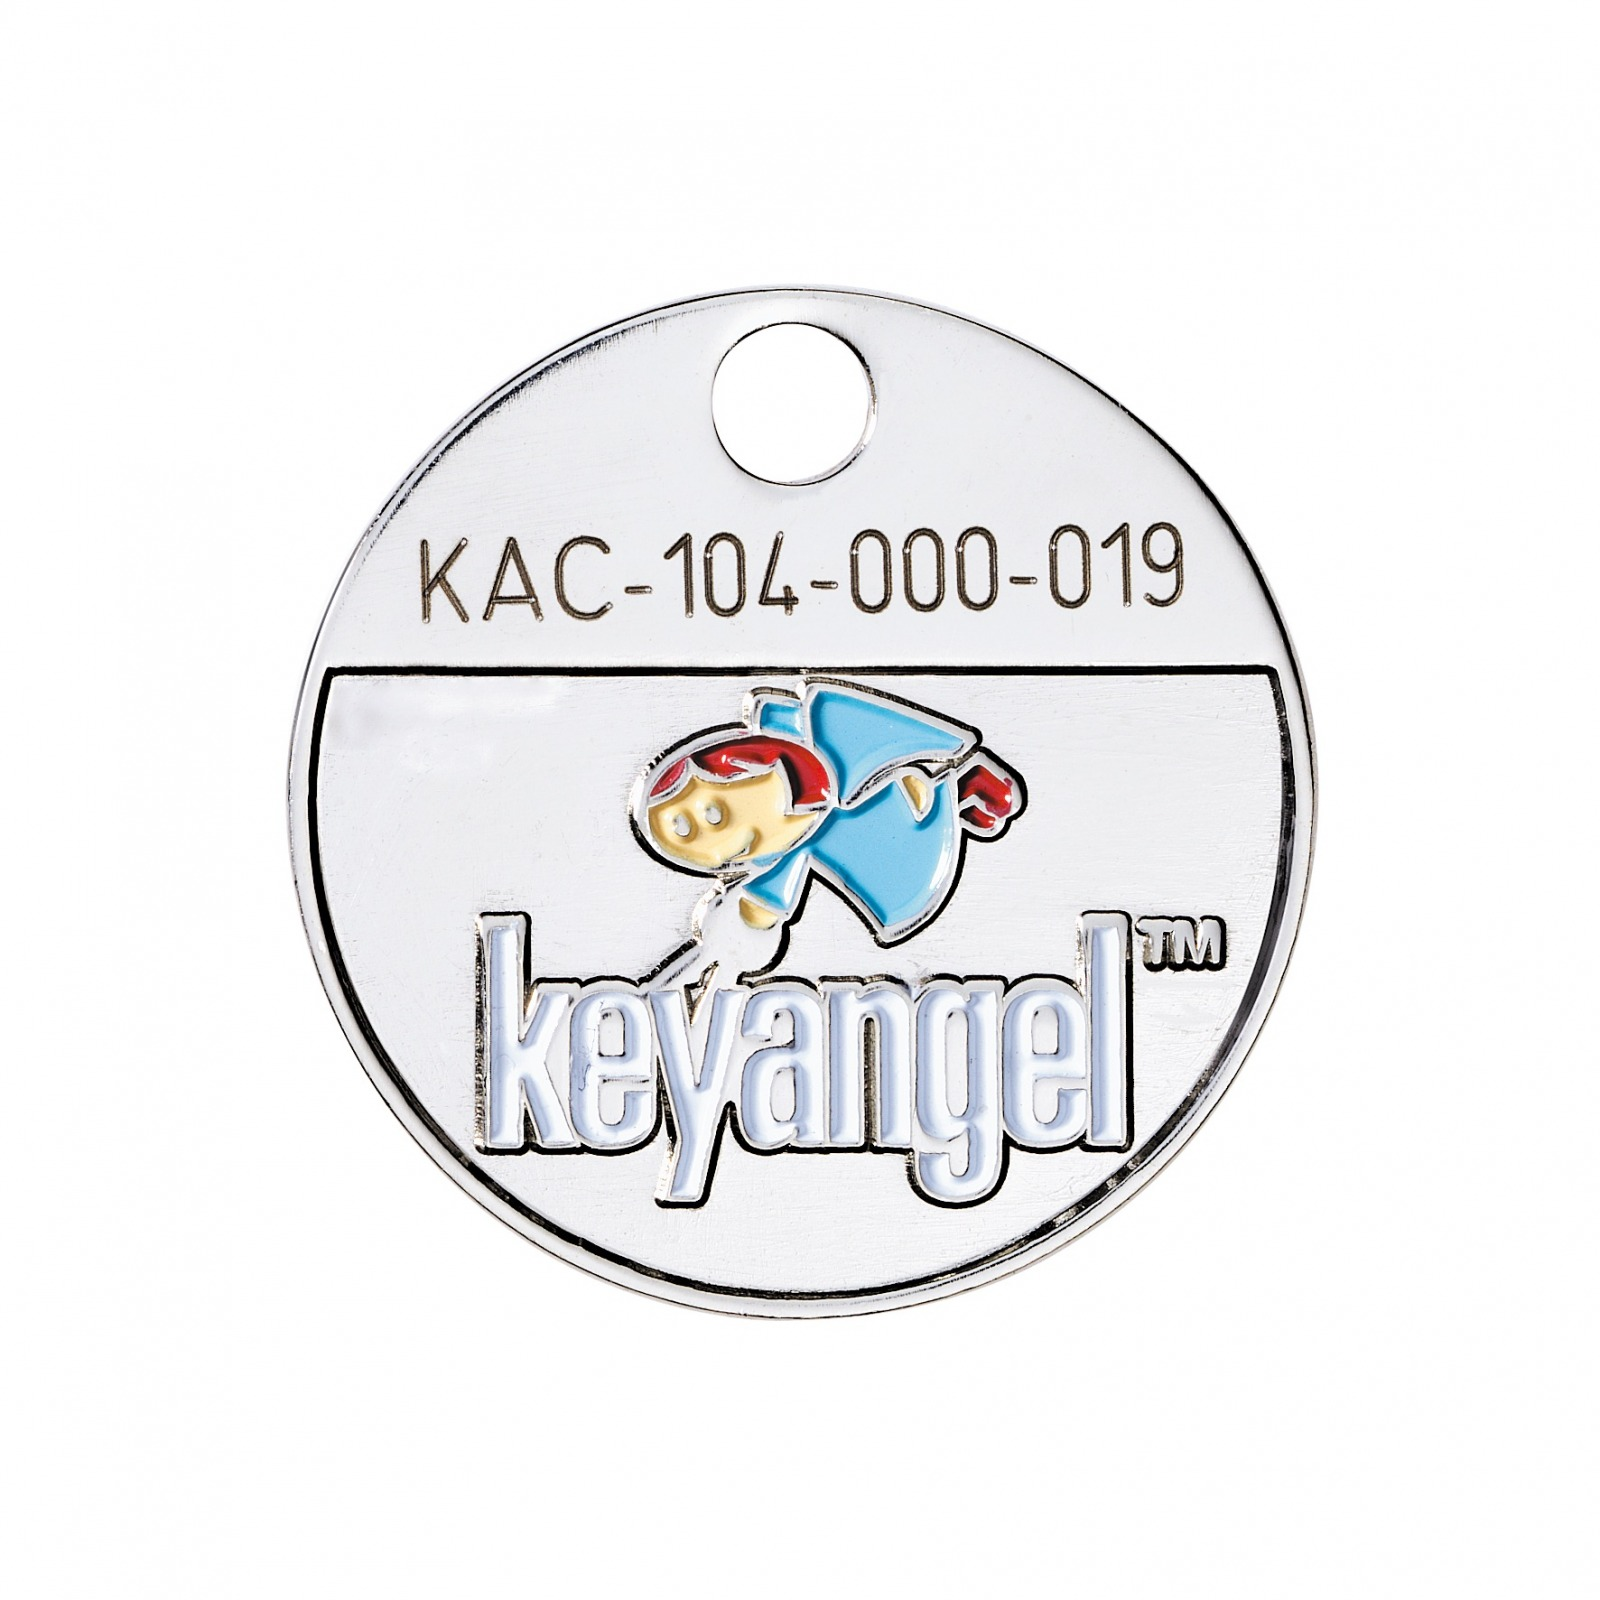 KeyAngel 3 2